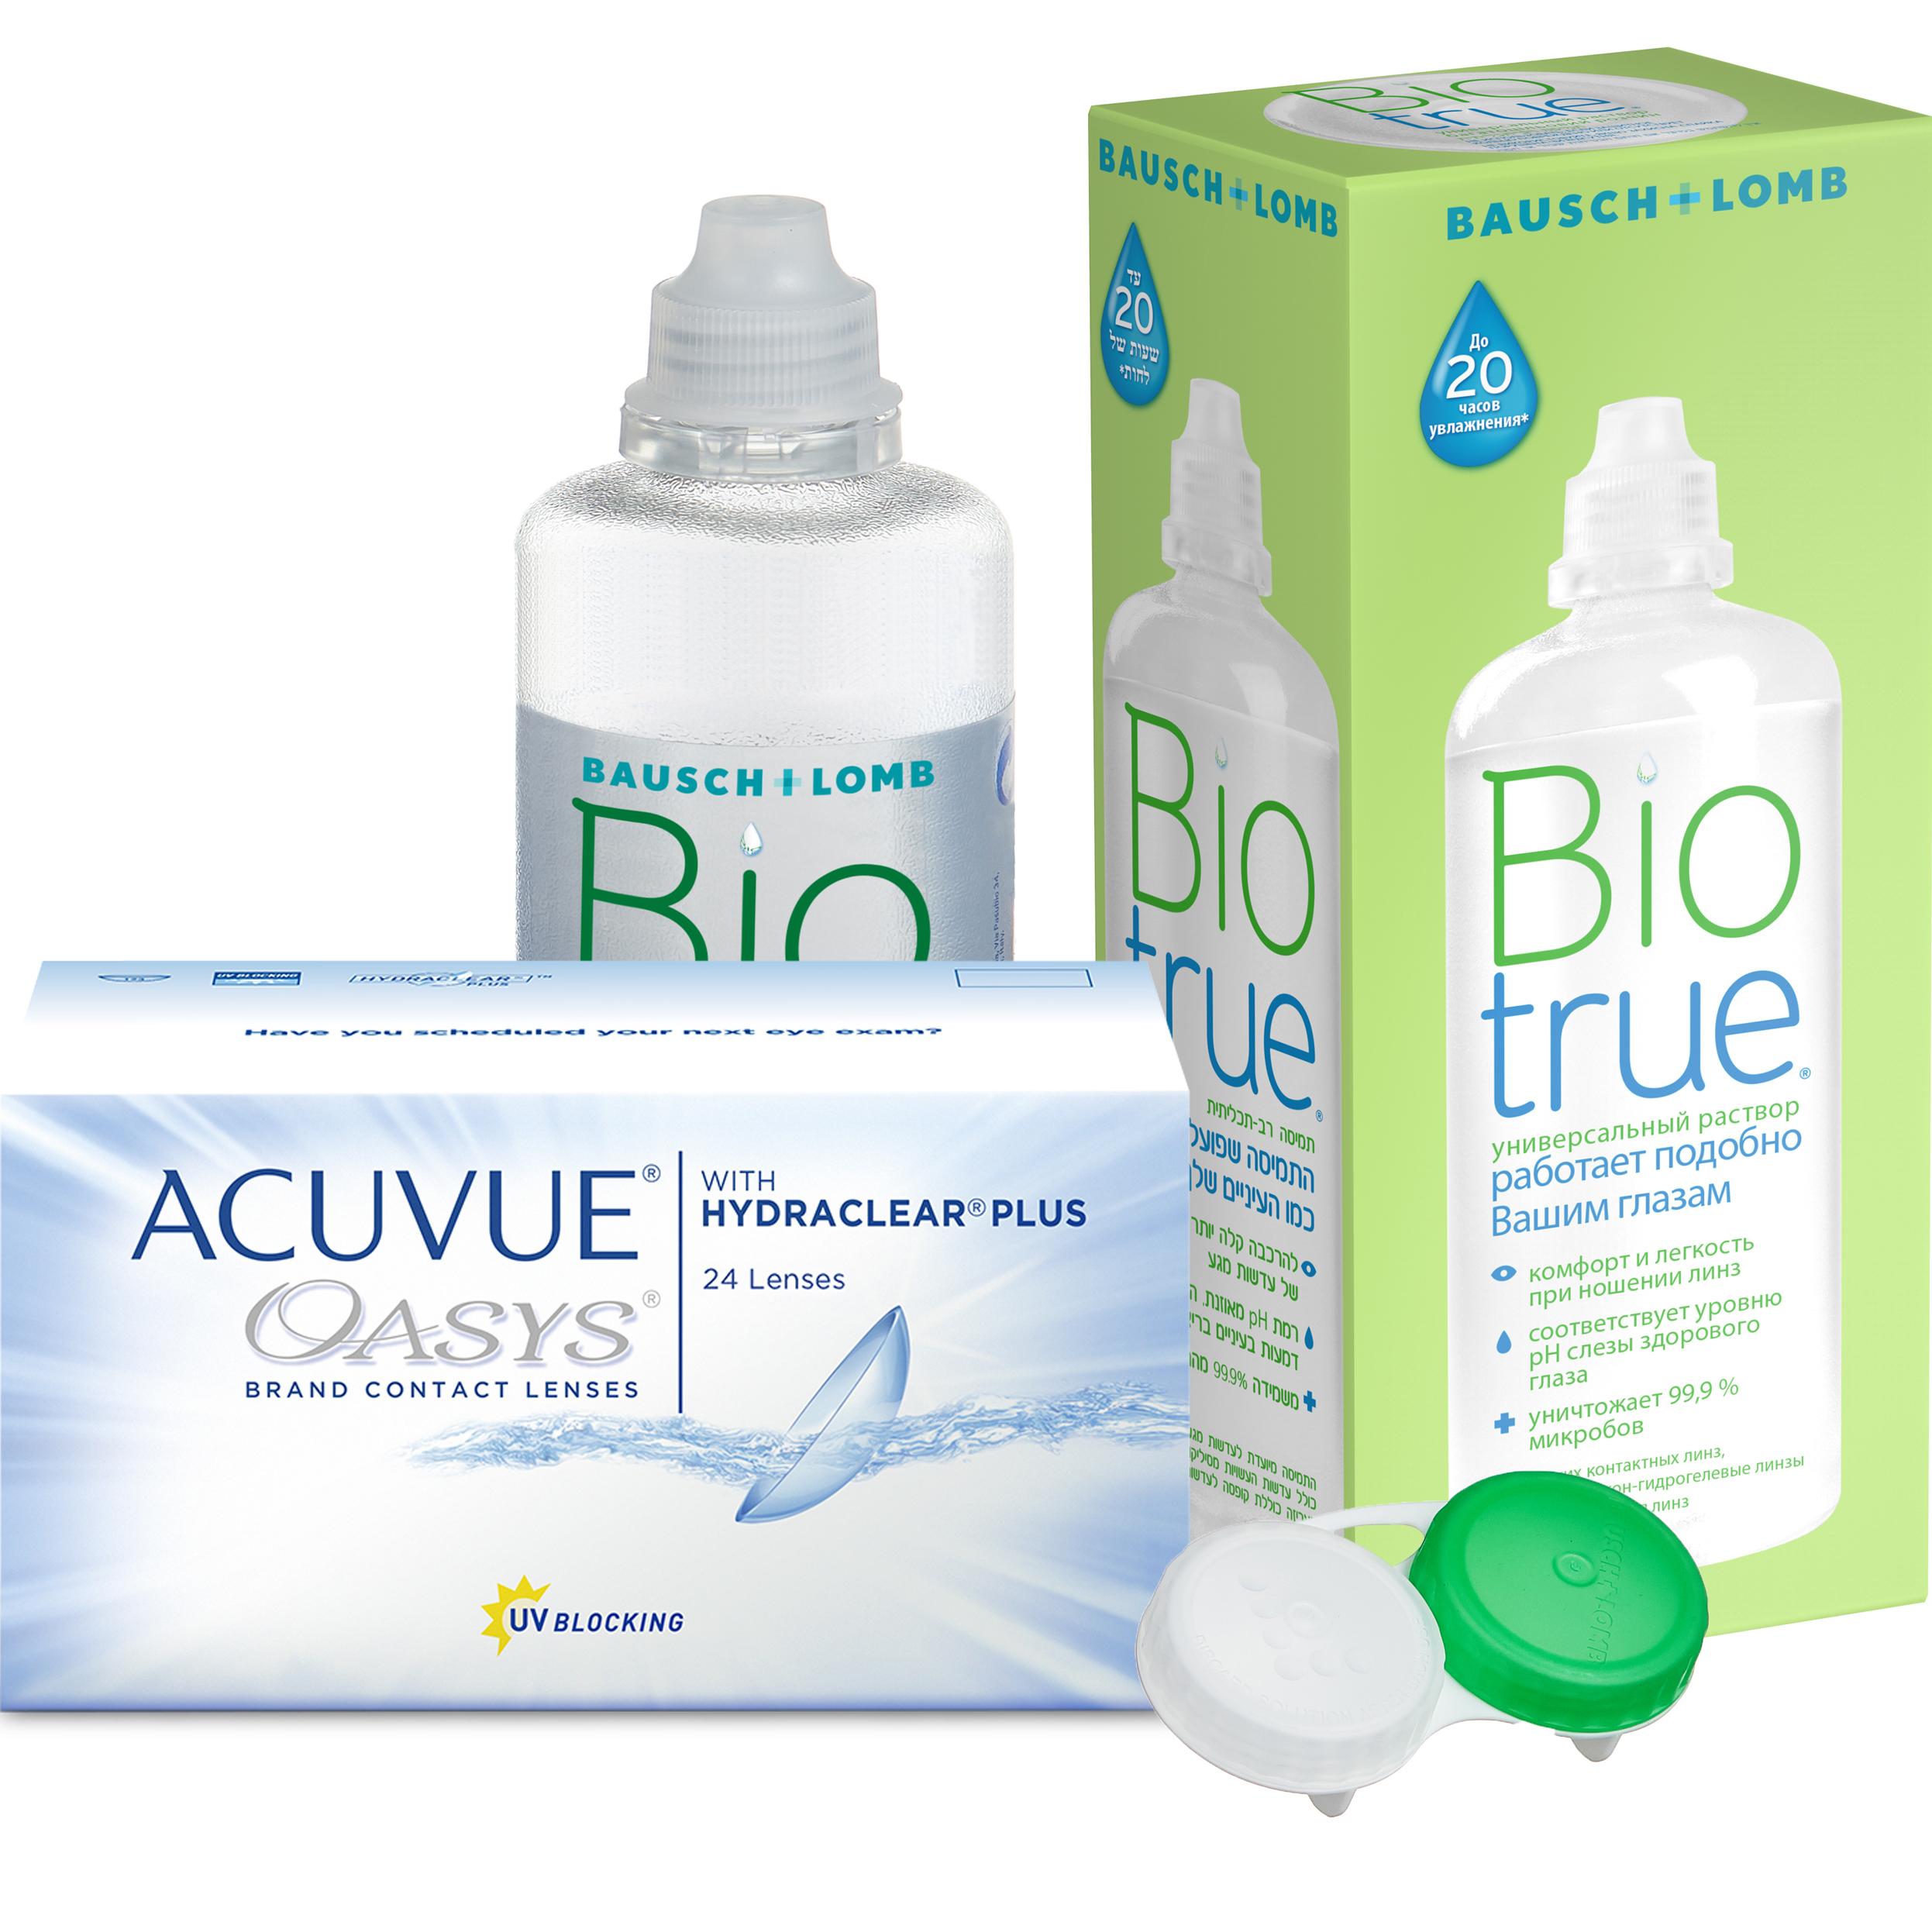 Купить Oasys with Hydraclear Plus 24 линзы + Biotrue, Контактные линзы Acuvue Oasys with Hydraclear Plus 24 линзы R 8.4 -3, 25 + Biotrue 300 мл